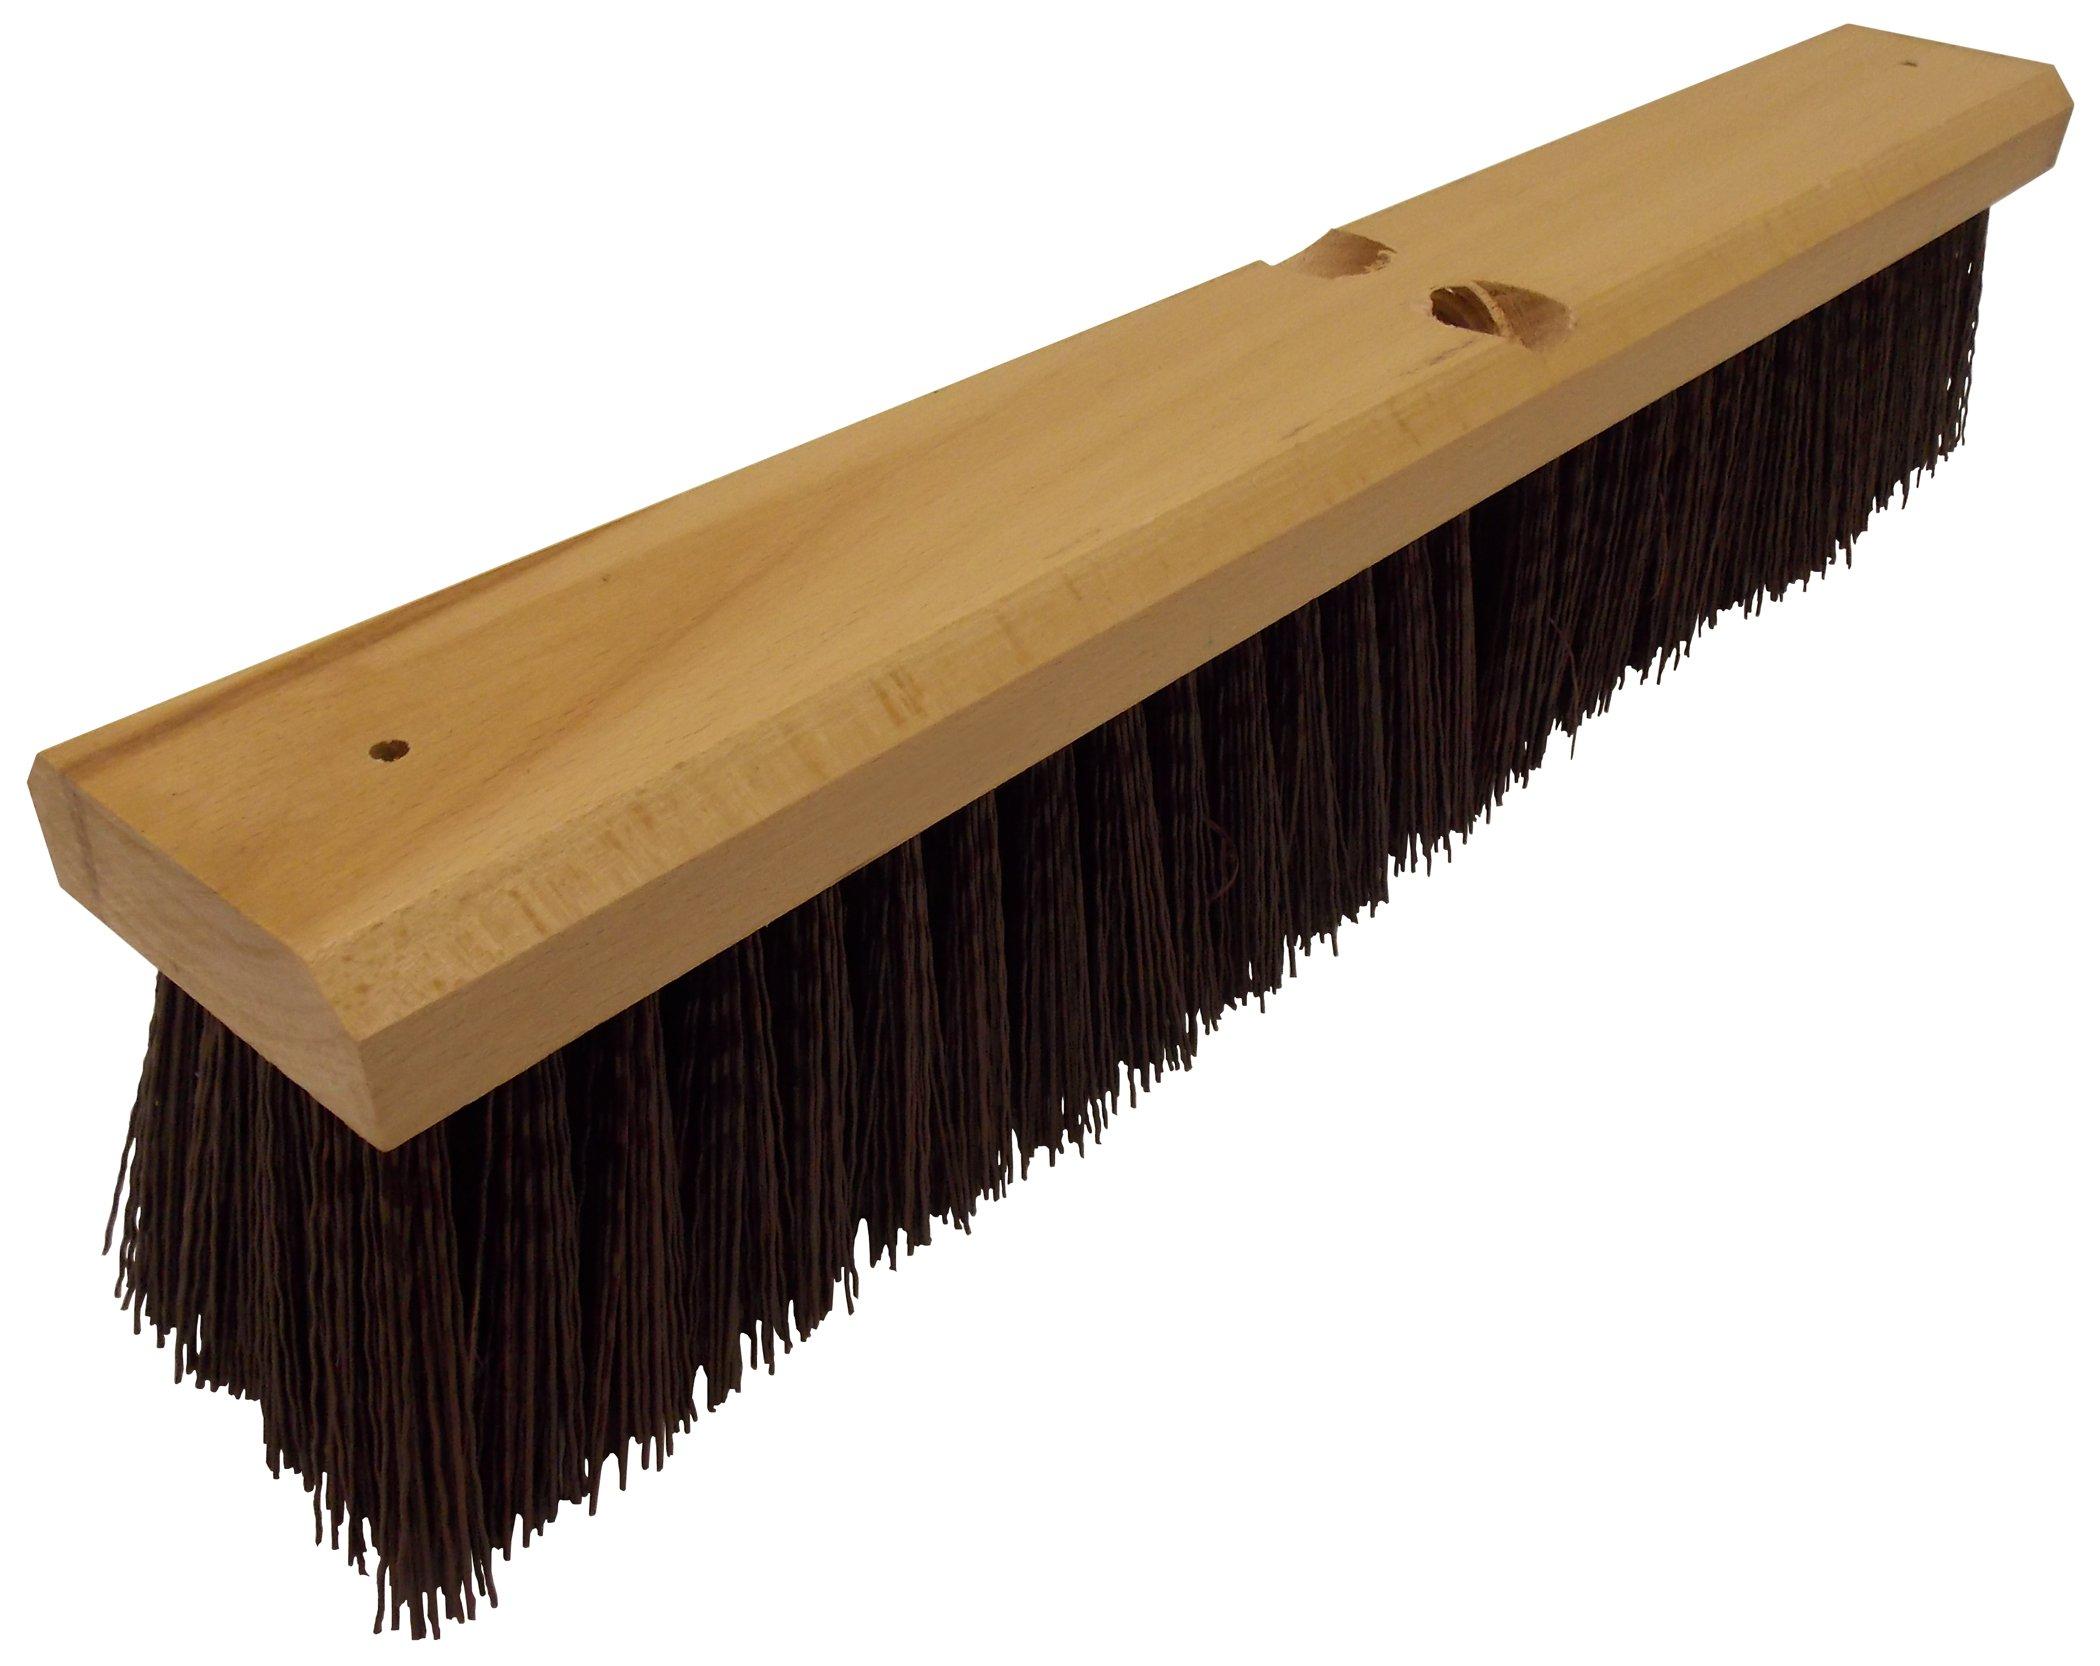 Wilen F103018, Crimped Polypropylene Garage Sweep, 18'' Wood Block, 3'' Bristle Trim (Case of 12)